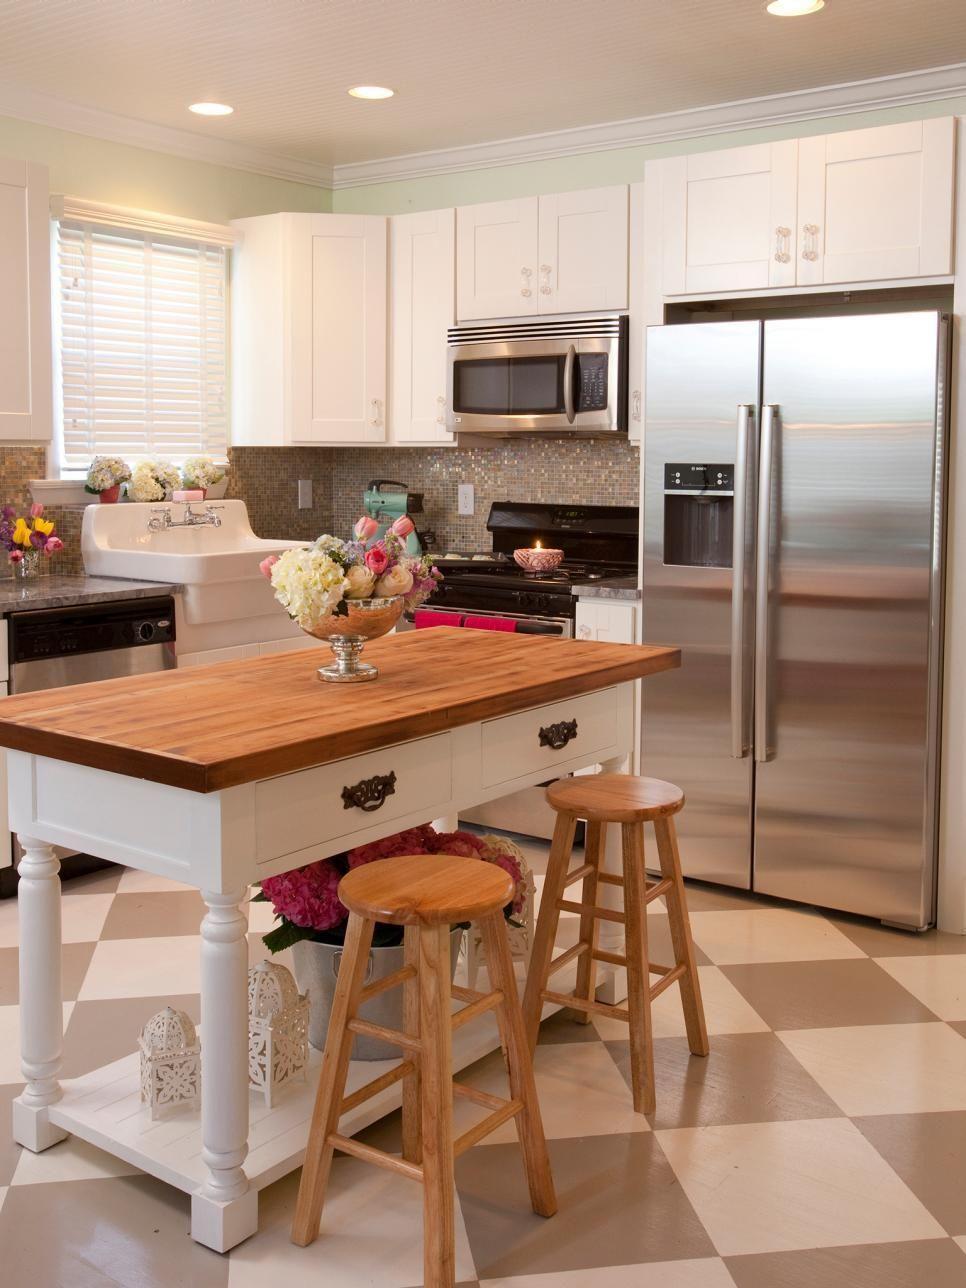 12+ Charming Concrete Counter Top Butcher Blocks Ideas